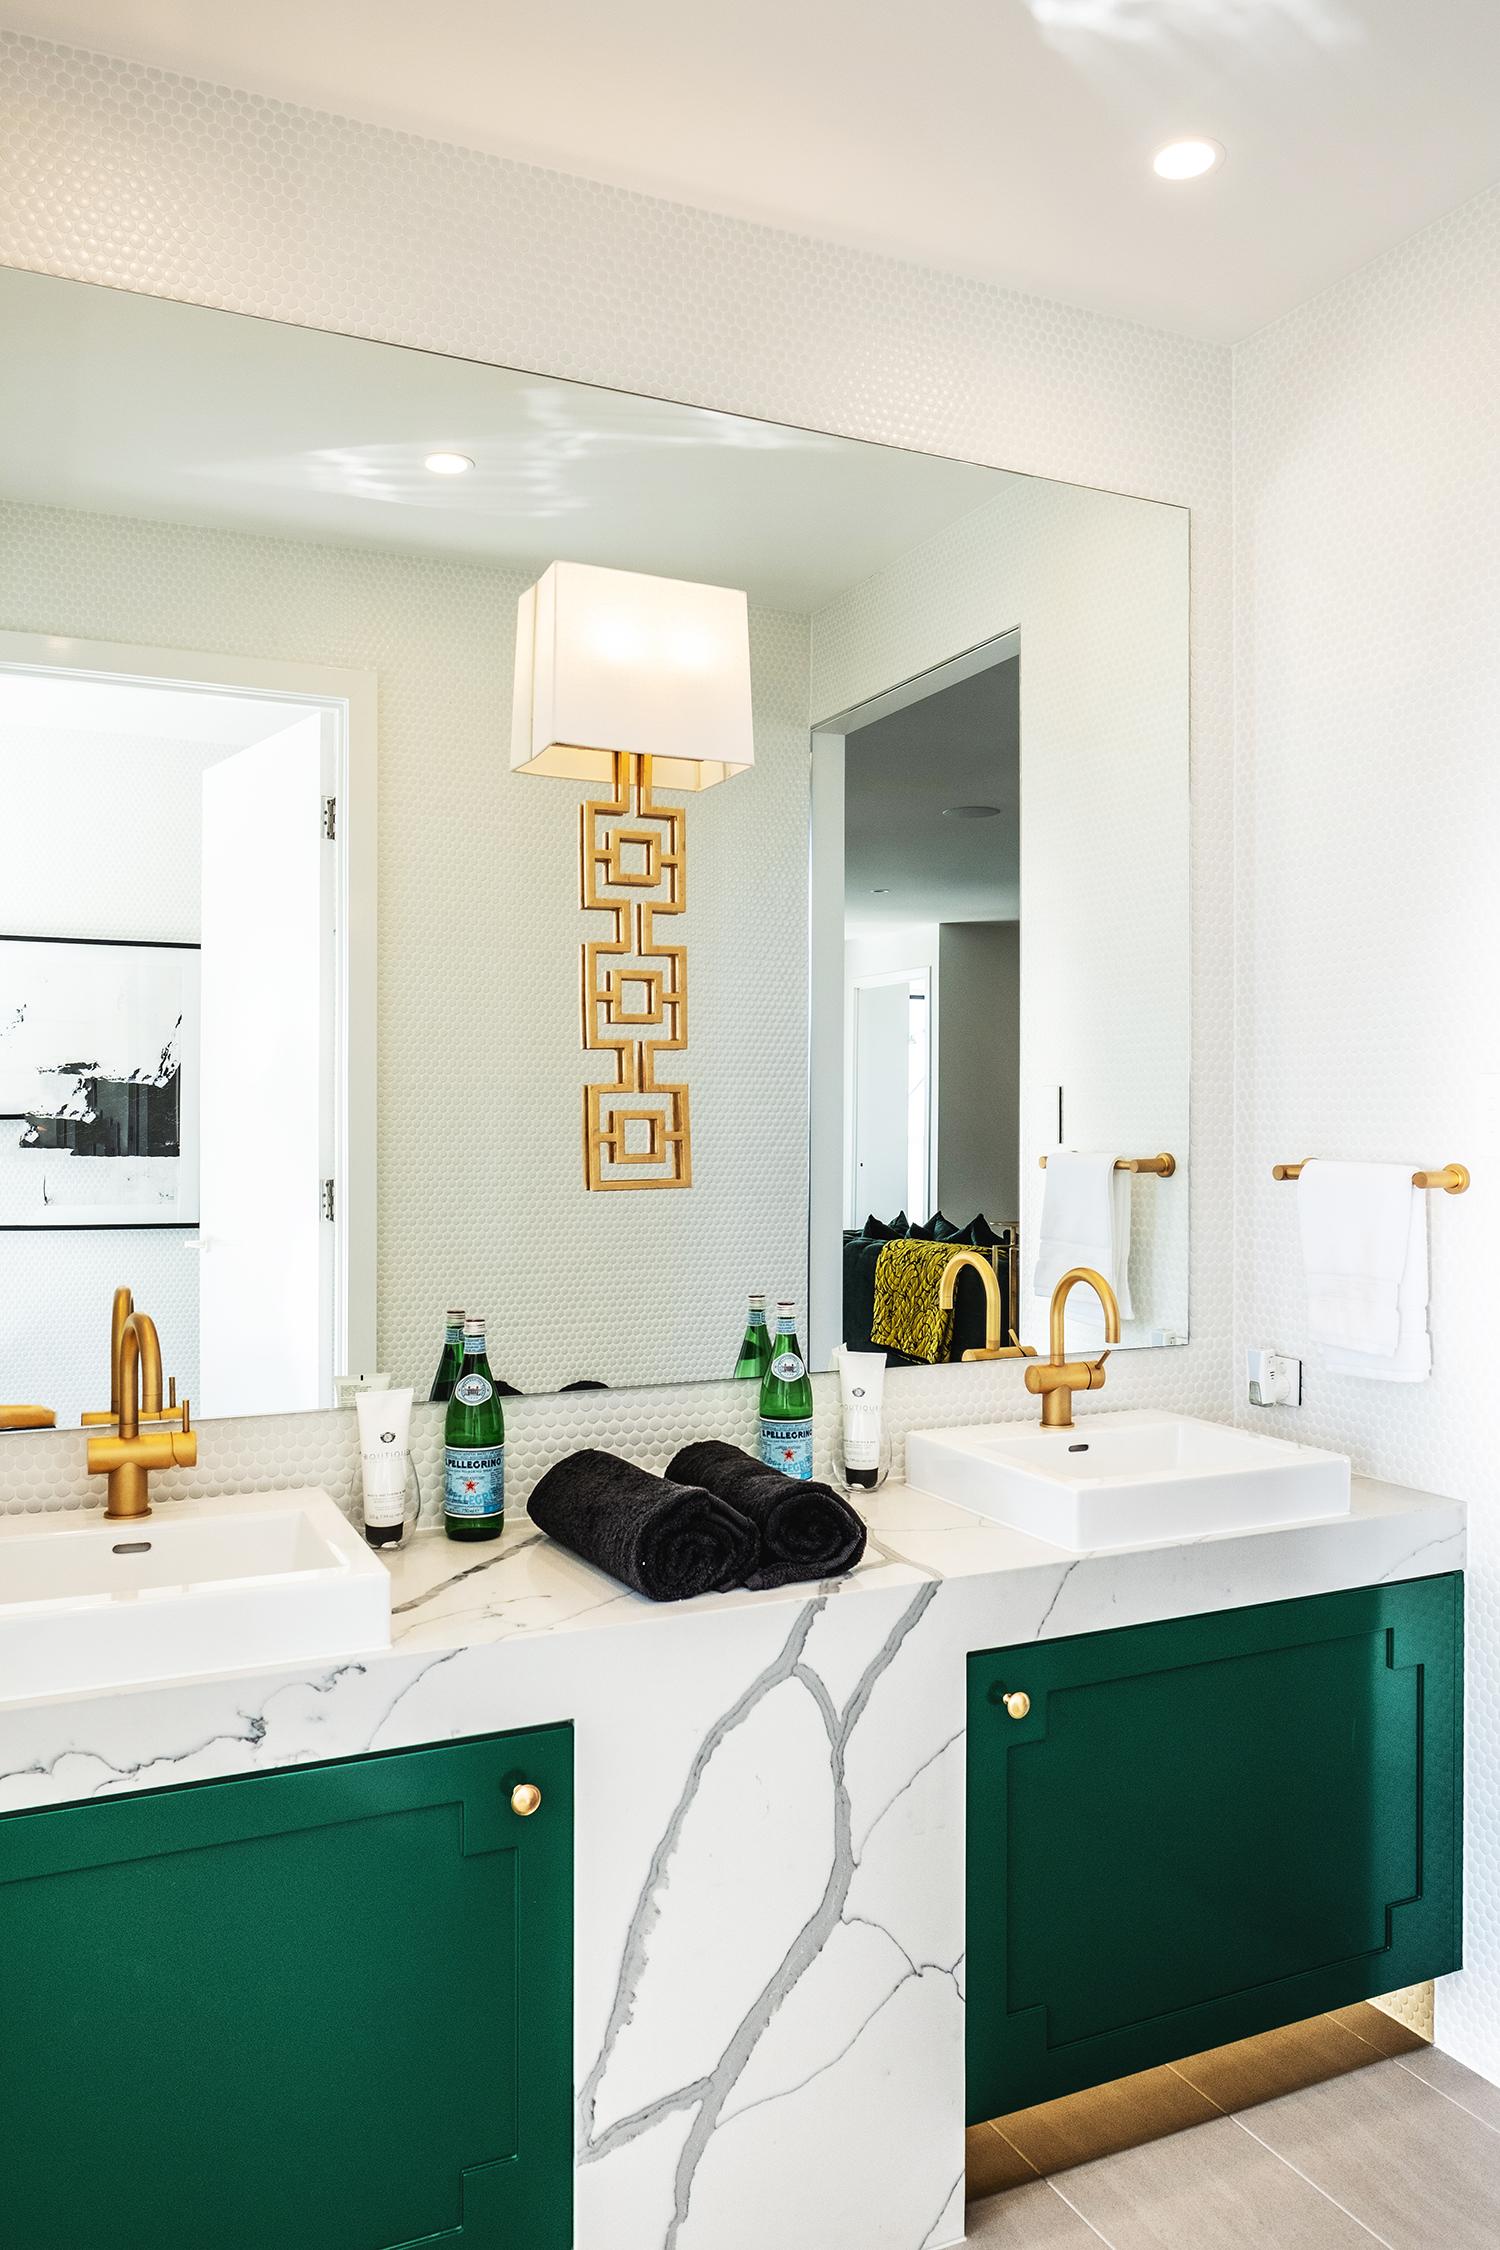 aston_milan_palm_springs_style_bathroom_kelly_green_gold_glamour_luxury_luxe.jpg